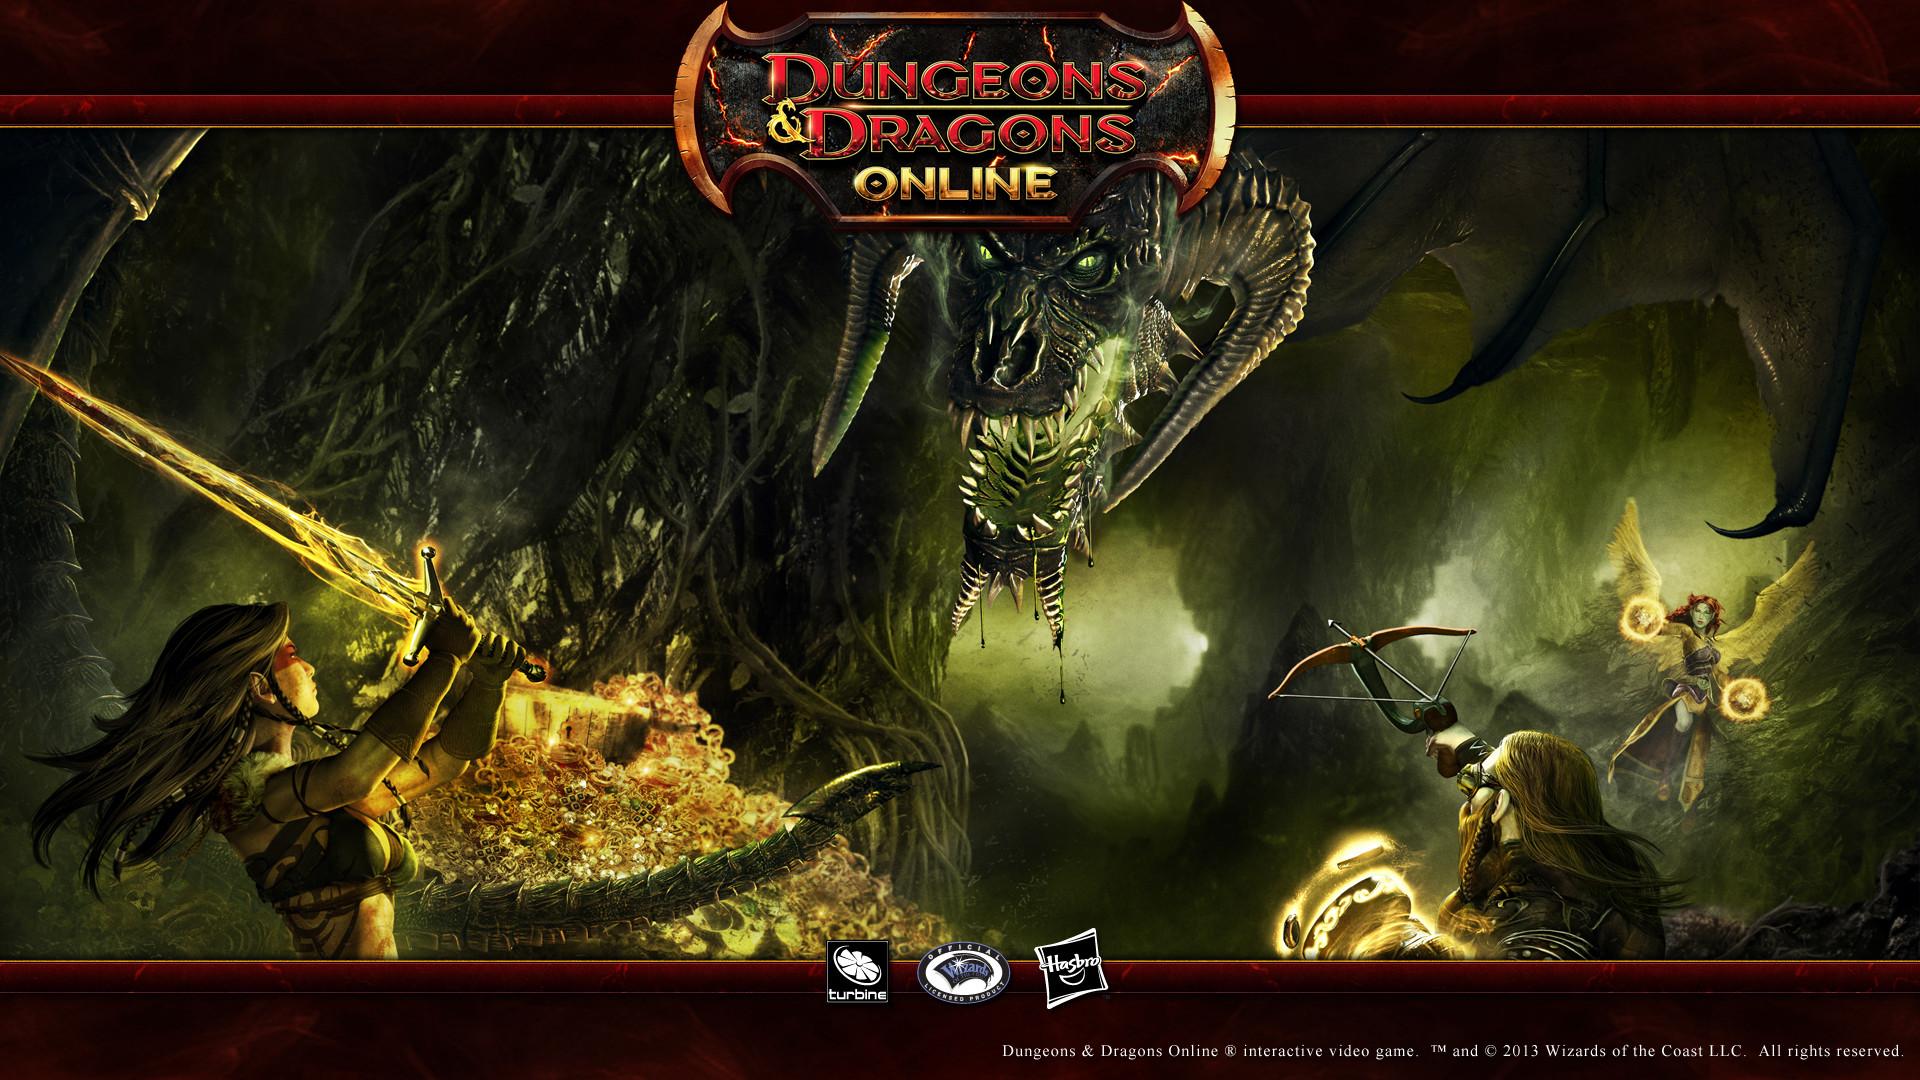 Dungeons & Dragons Online 16:9 Wallpaper – Black Dragon